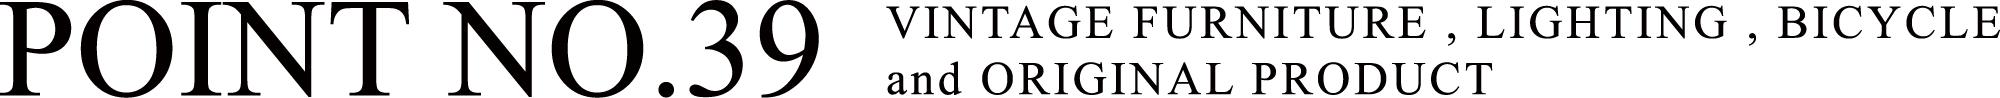 POINT NO.39 ONLINE STORE 目黒通り ヴィンテージ家具 照明 真鍮無垢材を使用したオリジナル照明